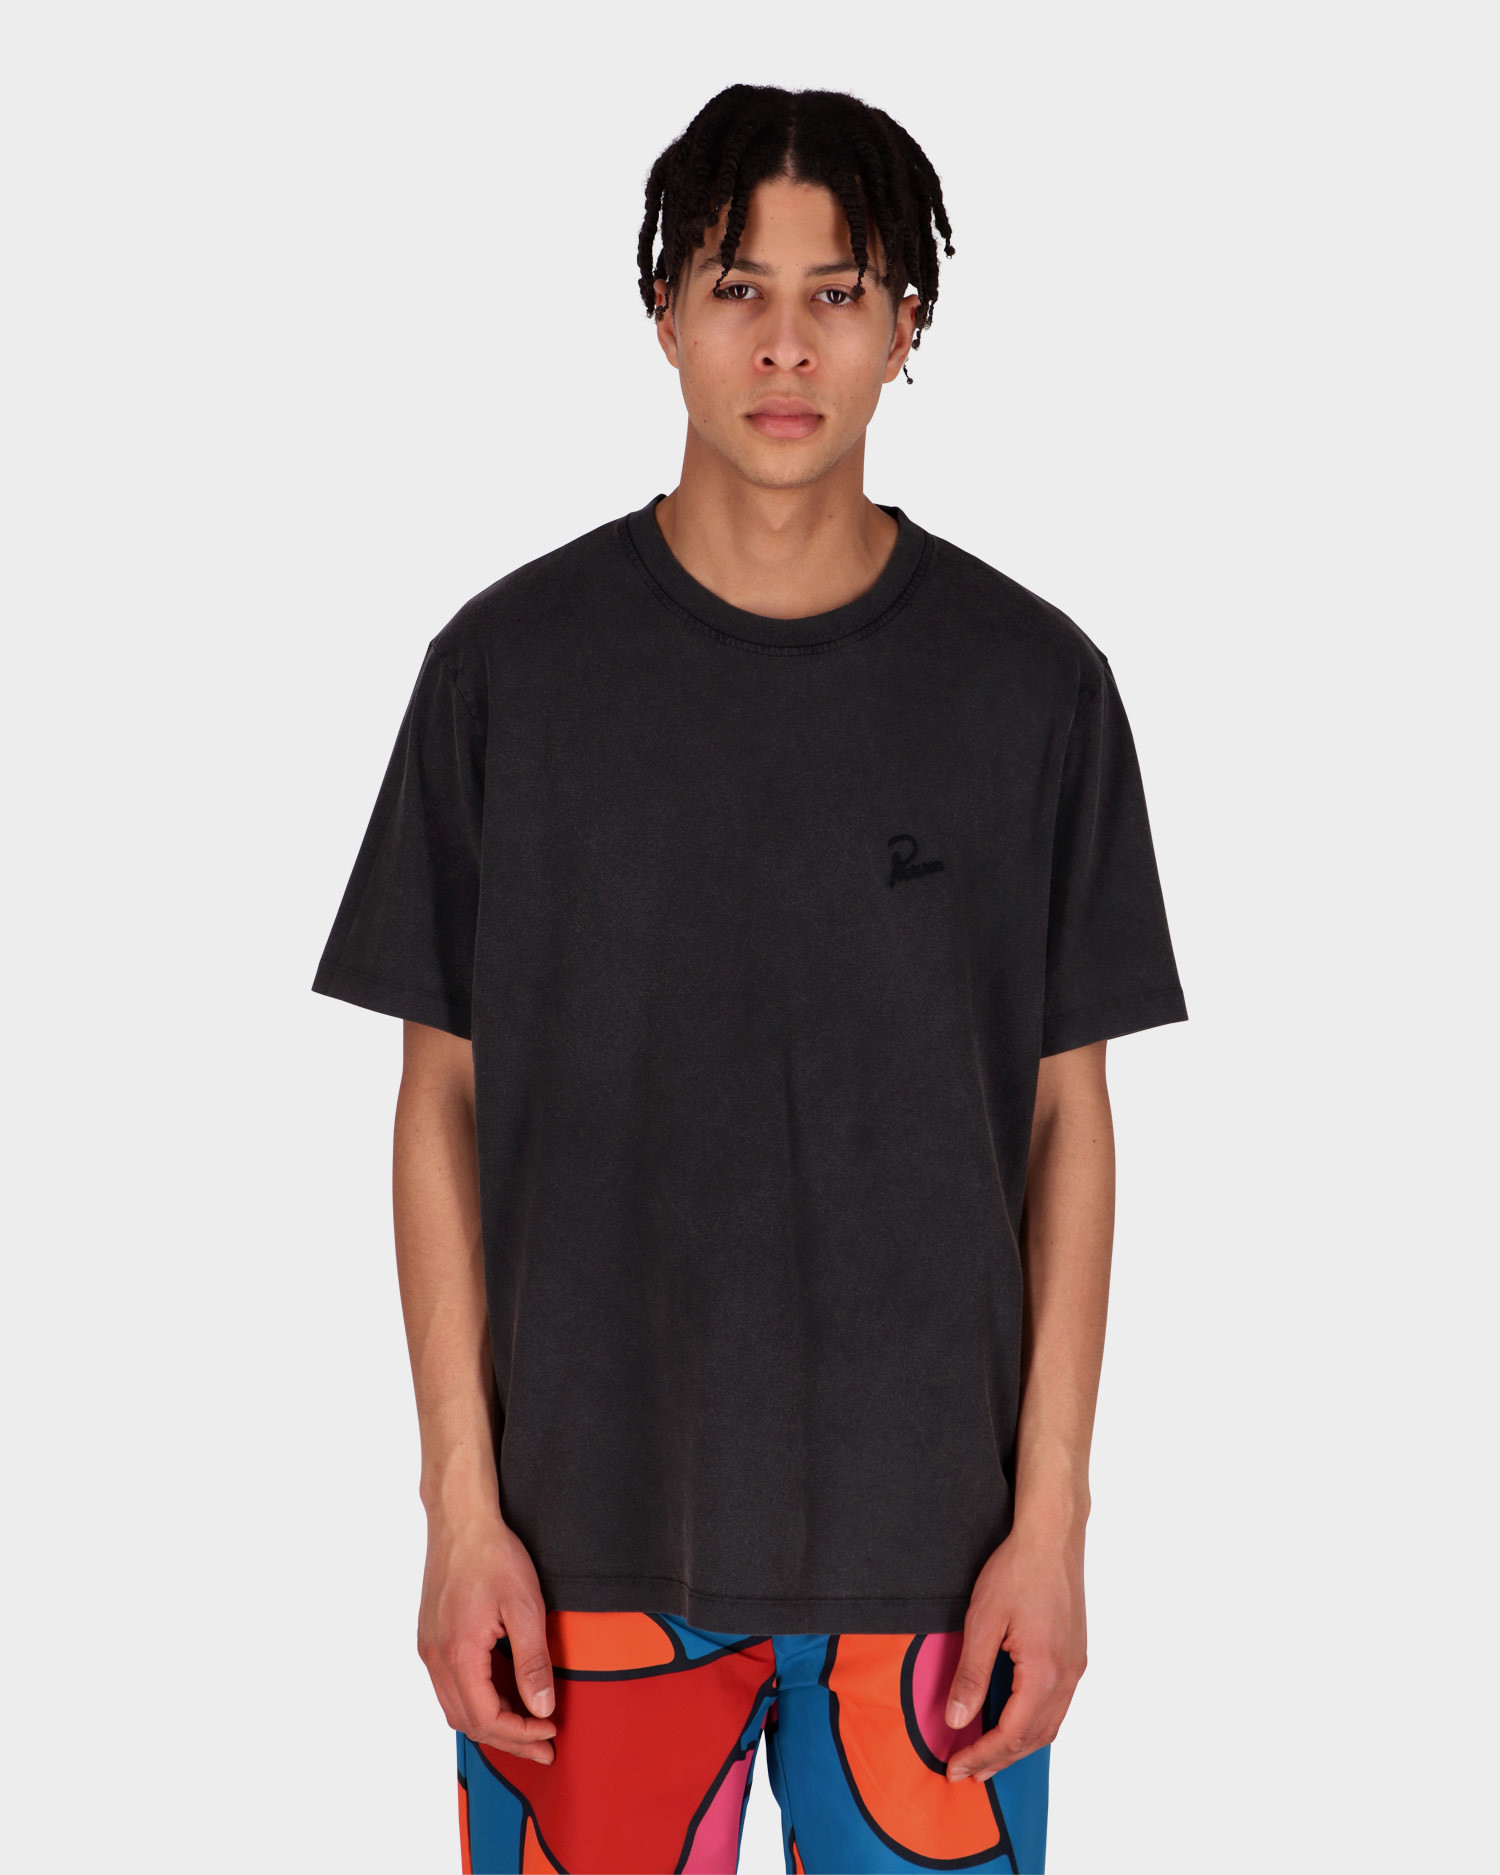 Parra washed out logo t-shirt washed black